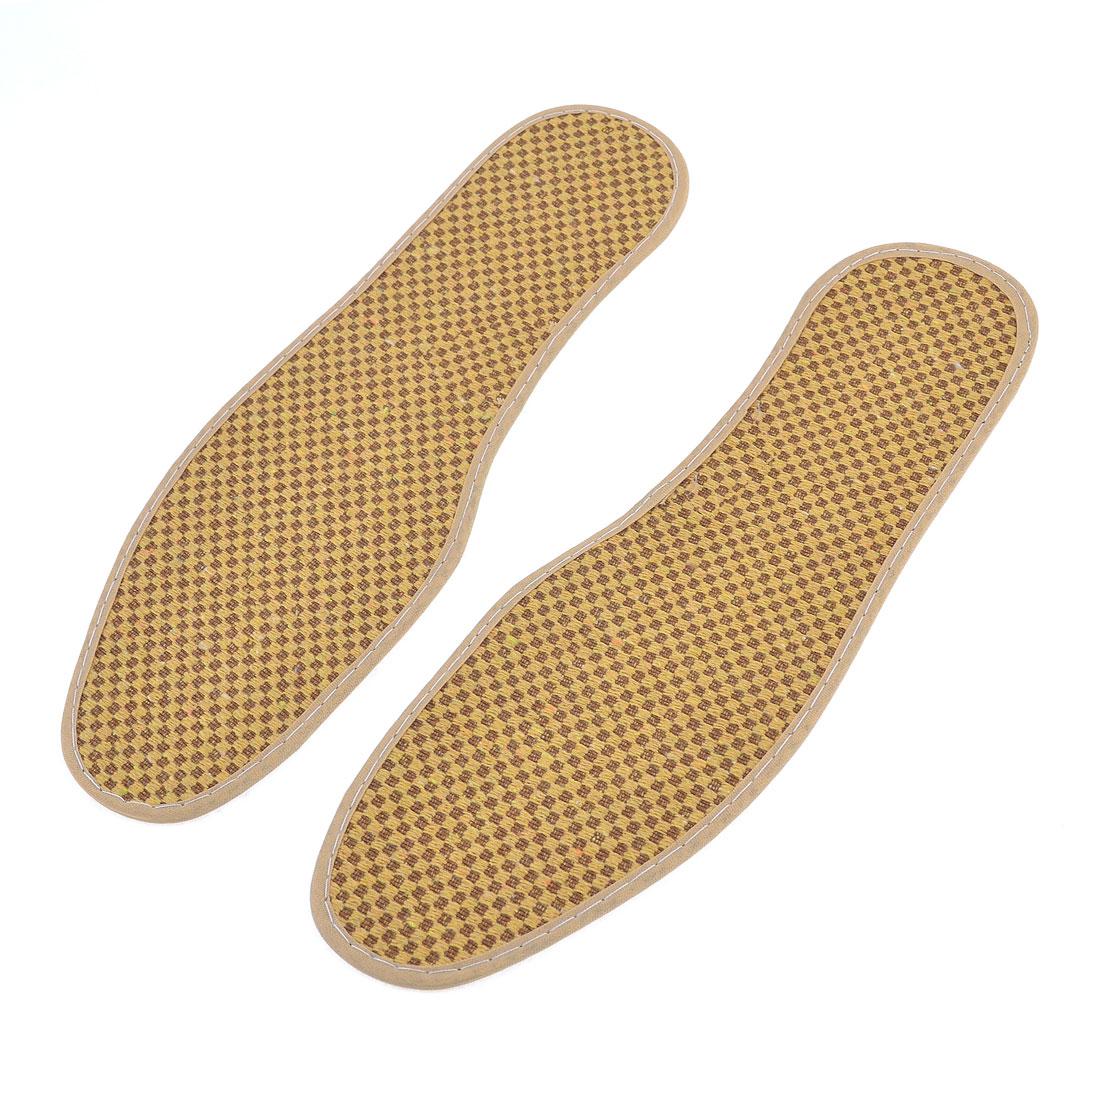 Pair Rhombus Print Textured Nonslip Shoe Pads Insoles UK Size 7.5 Yellow Brown